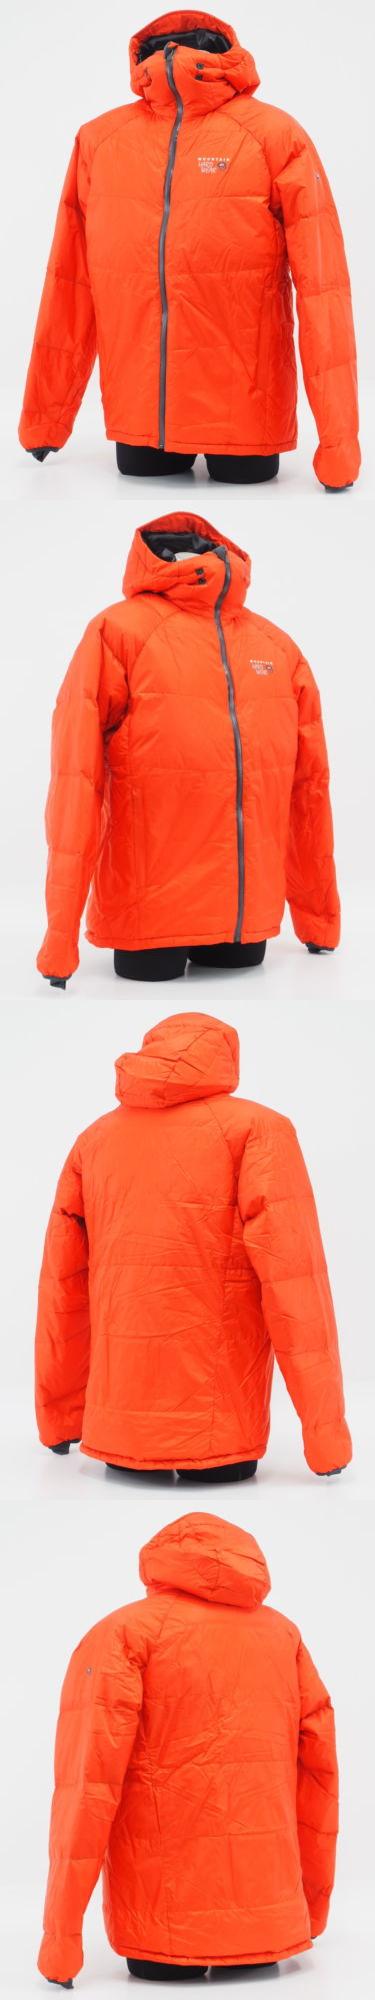 dac745ca09dc Coats and Jackets 26346  New! Mountain Hardwear Orange Size Medium Nilas Ski  Snowboard Jacket